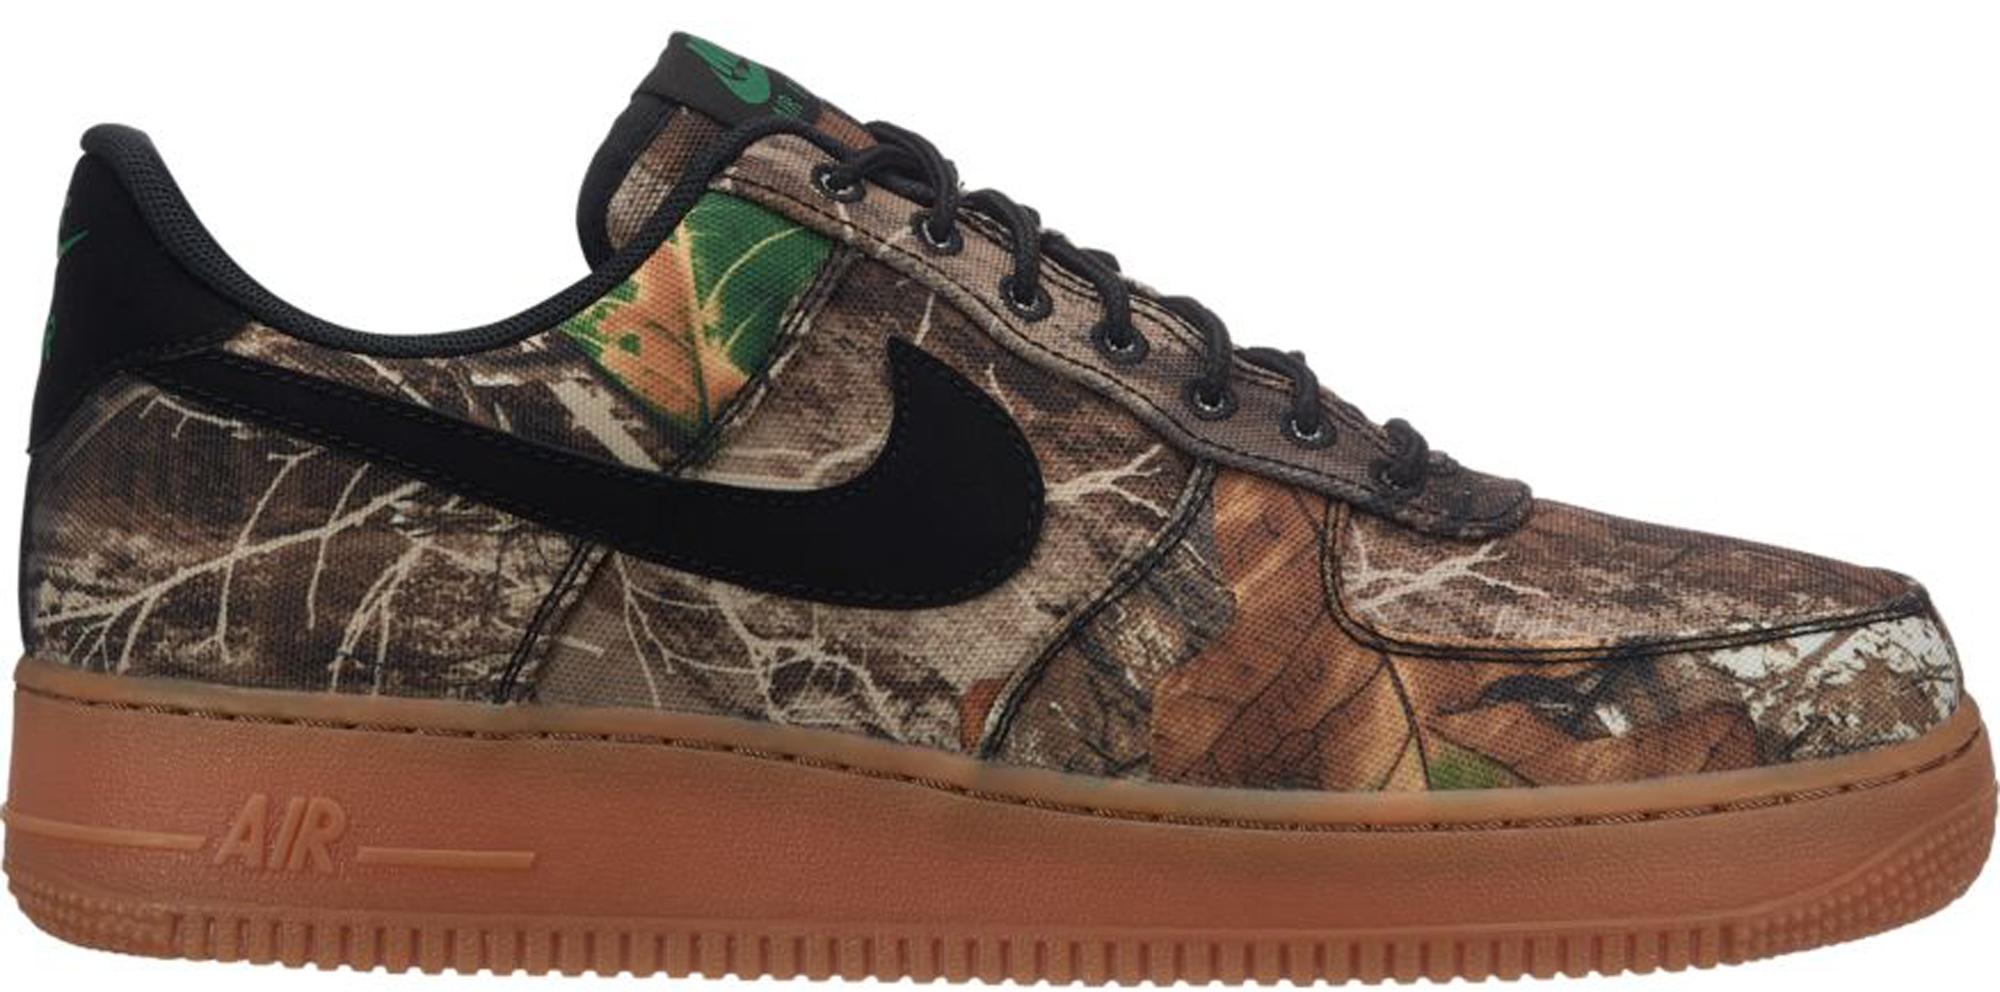 Nike Air Force 1 Low Realtree Black